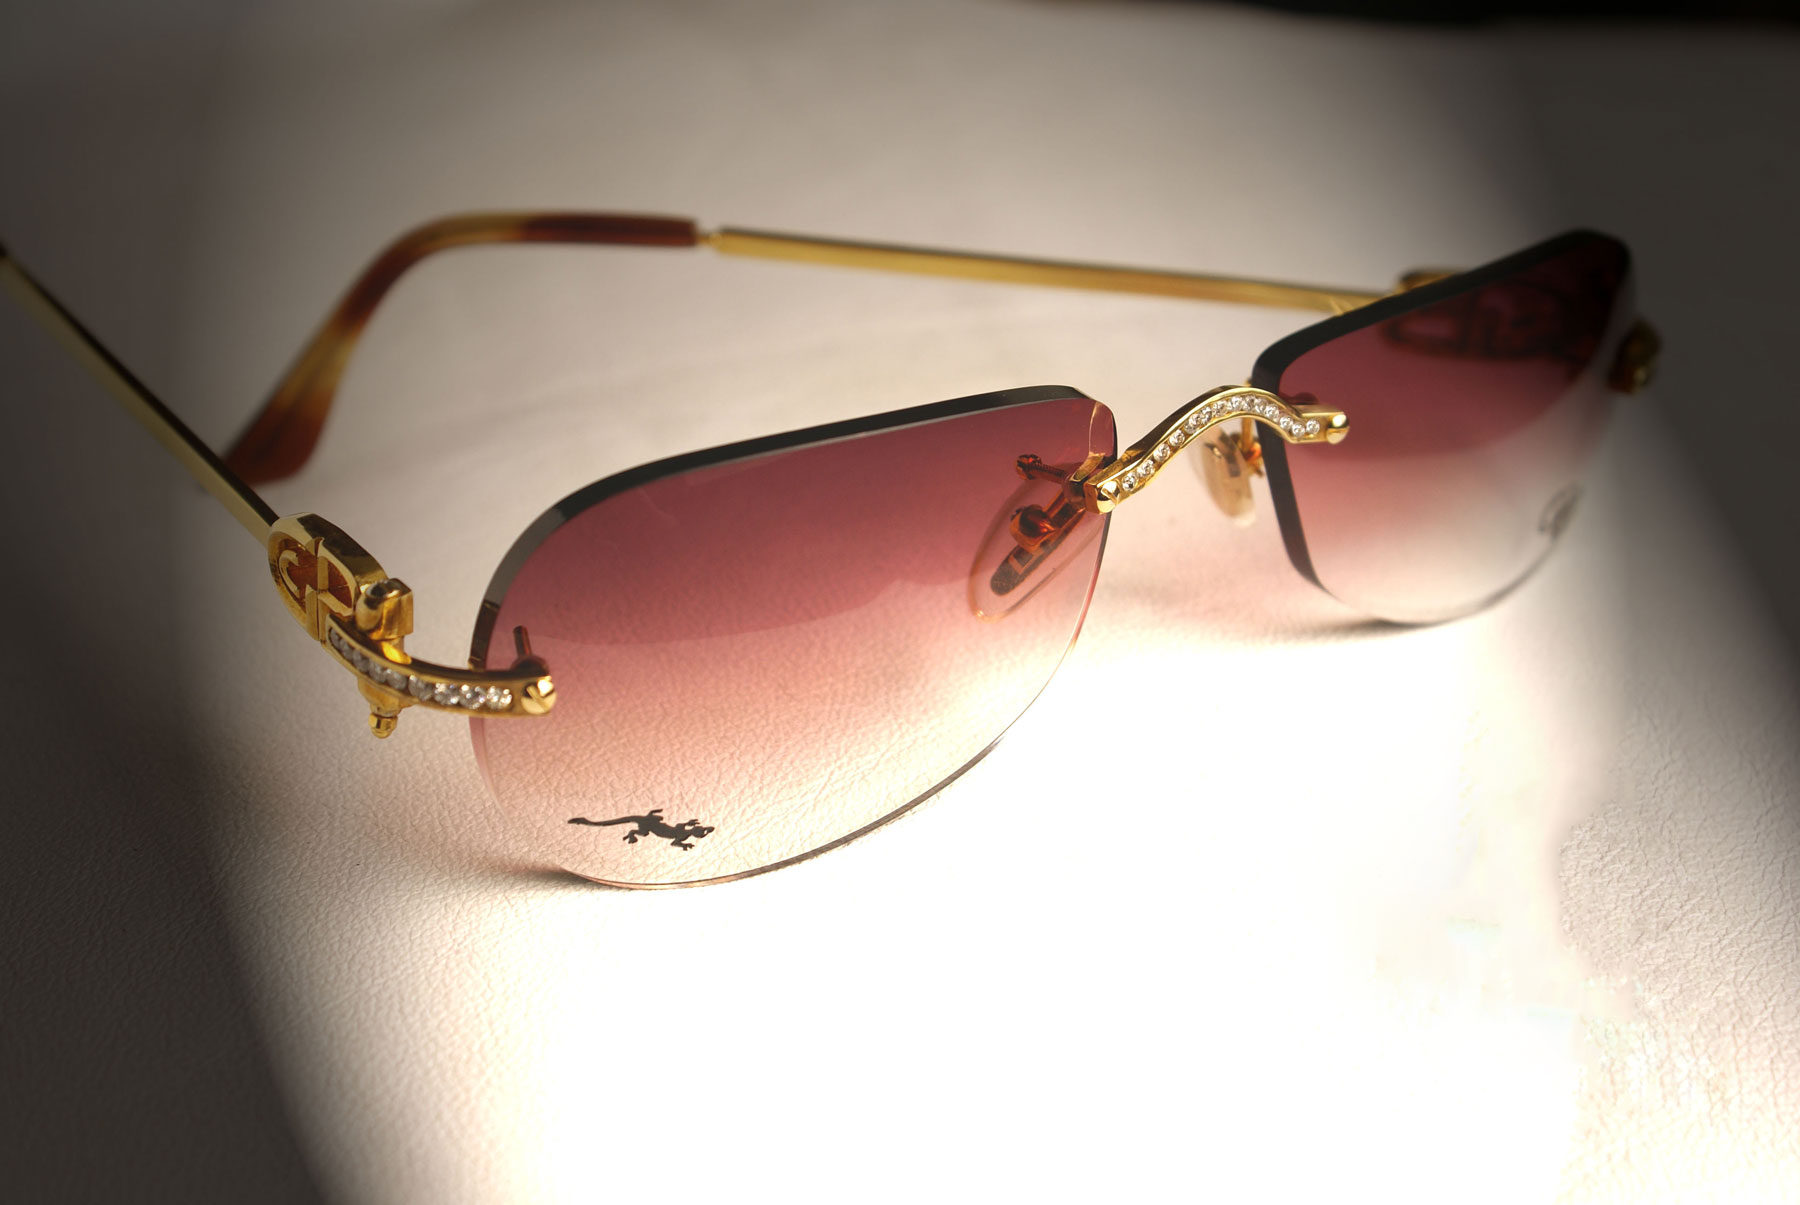 Chameleon Eyewear Y6